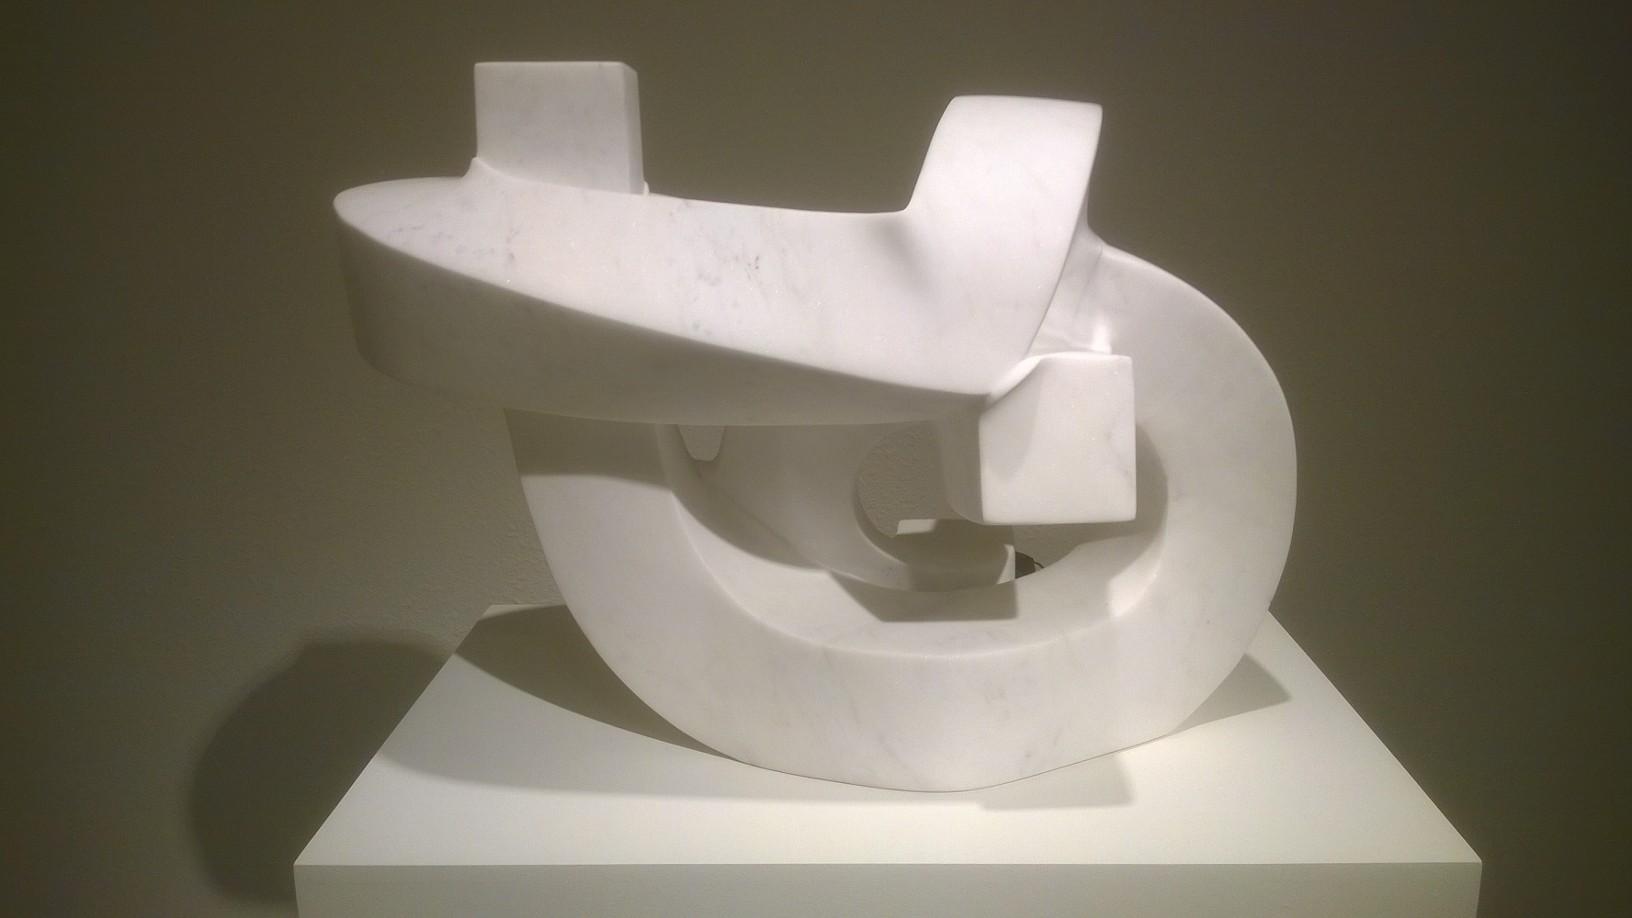 Paul Bloch,   White Ribbons,  Carrara marble, 20 x 28 x 18 inches